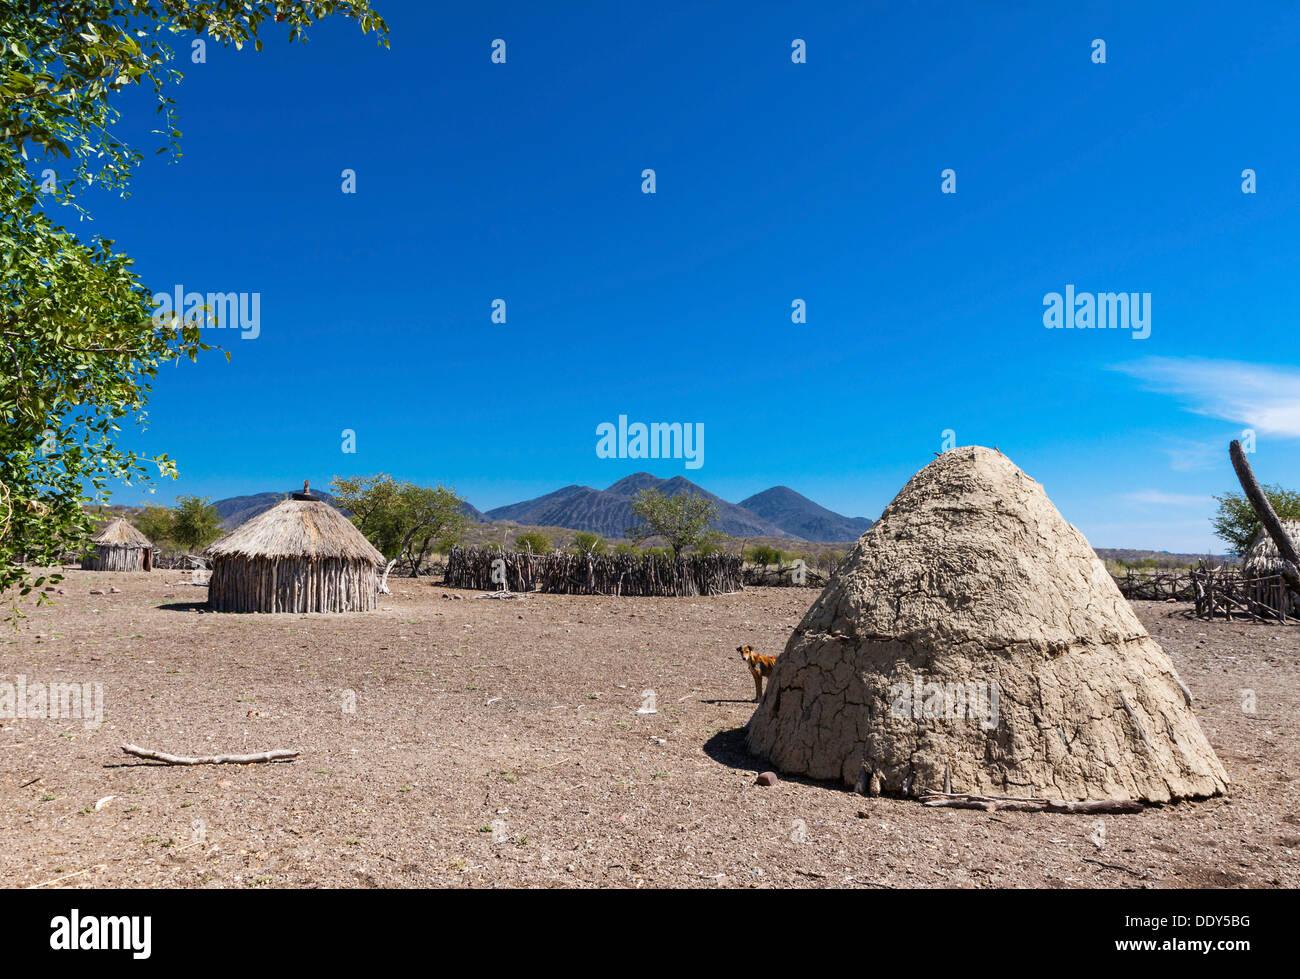 Himba settlement - Stock Image